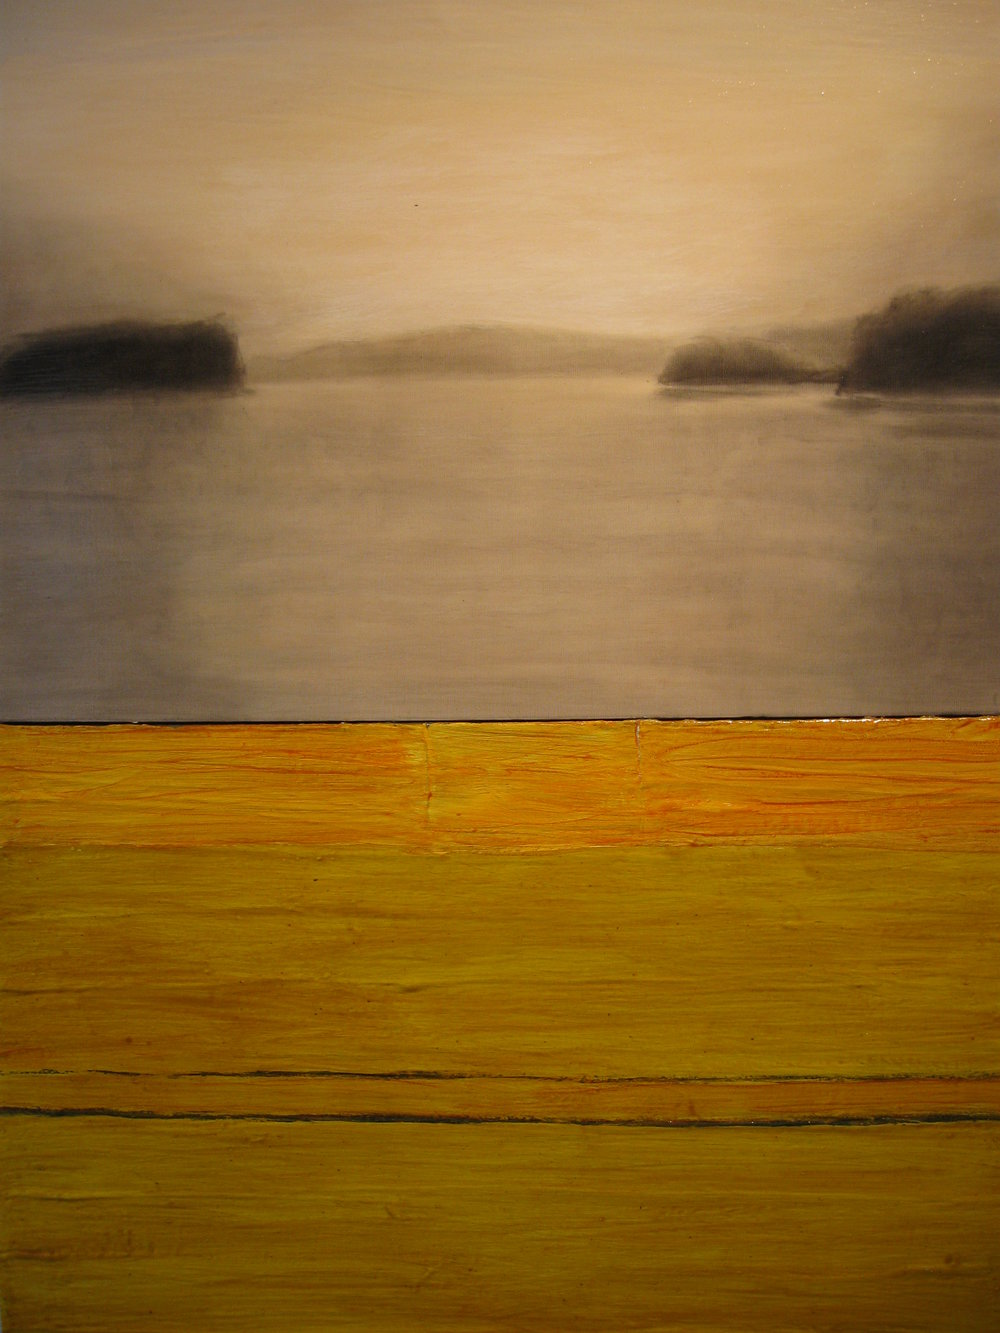 """Calendar #2"" by Chuck Swanson.Acrylic on canvas, 54x40in, POR"